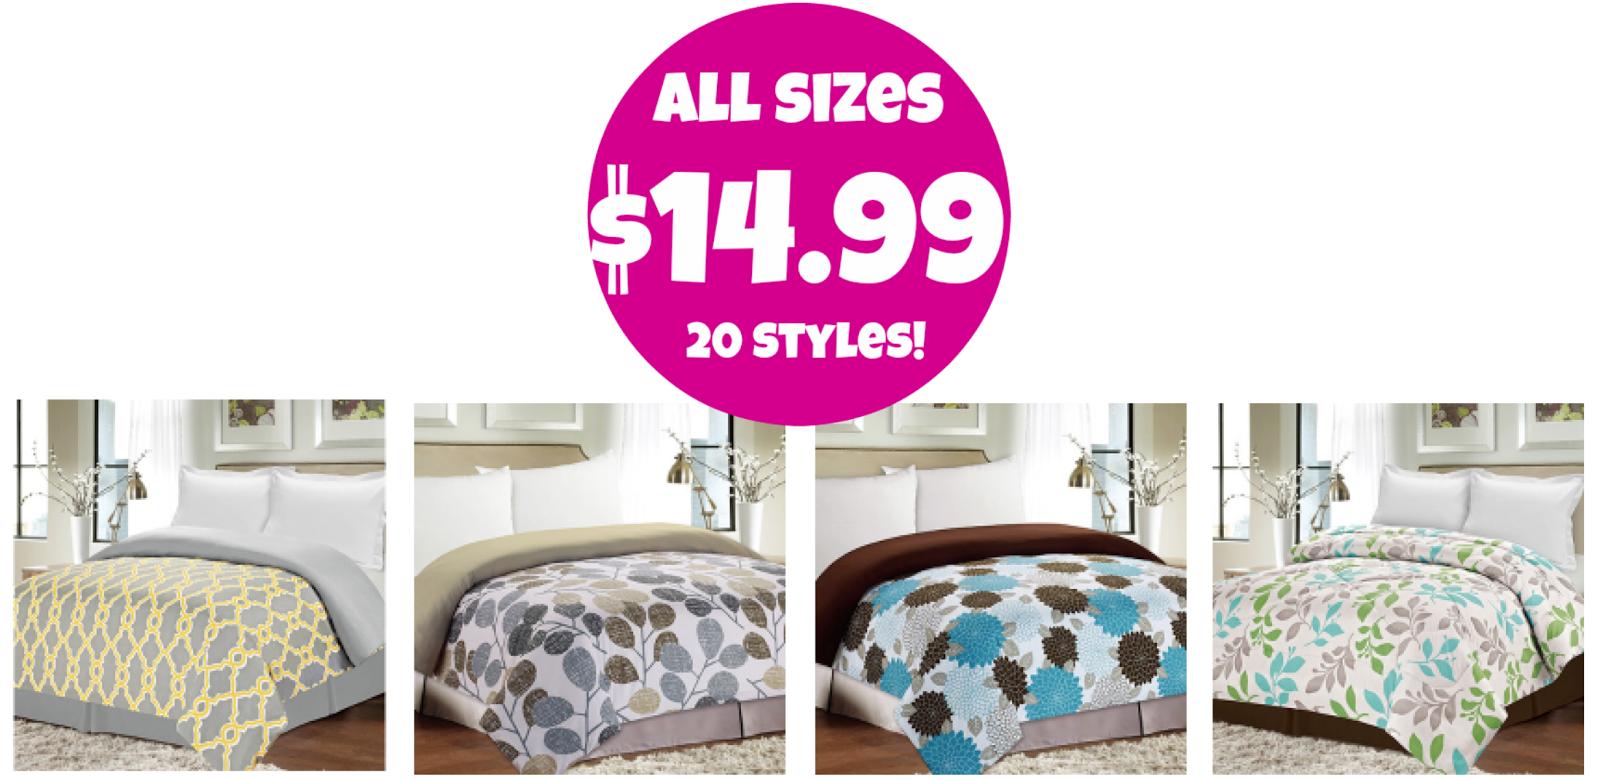 http://www.thebinderladies.com/2015/01/boscovs-bedding-comforters-20-styles.html#.VLab2ofduyM